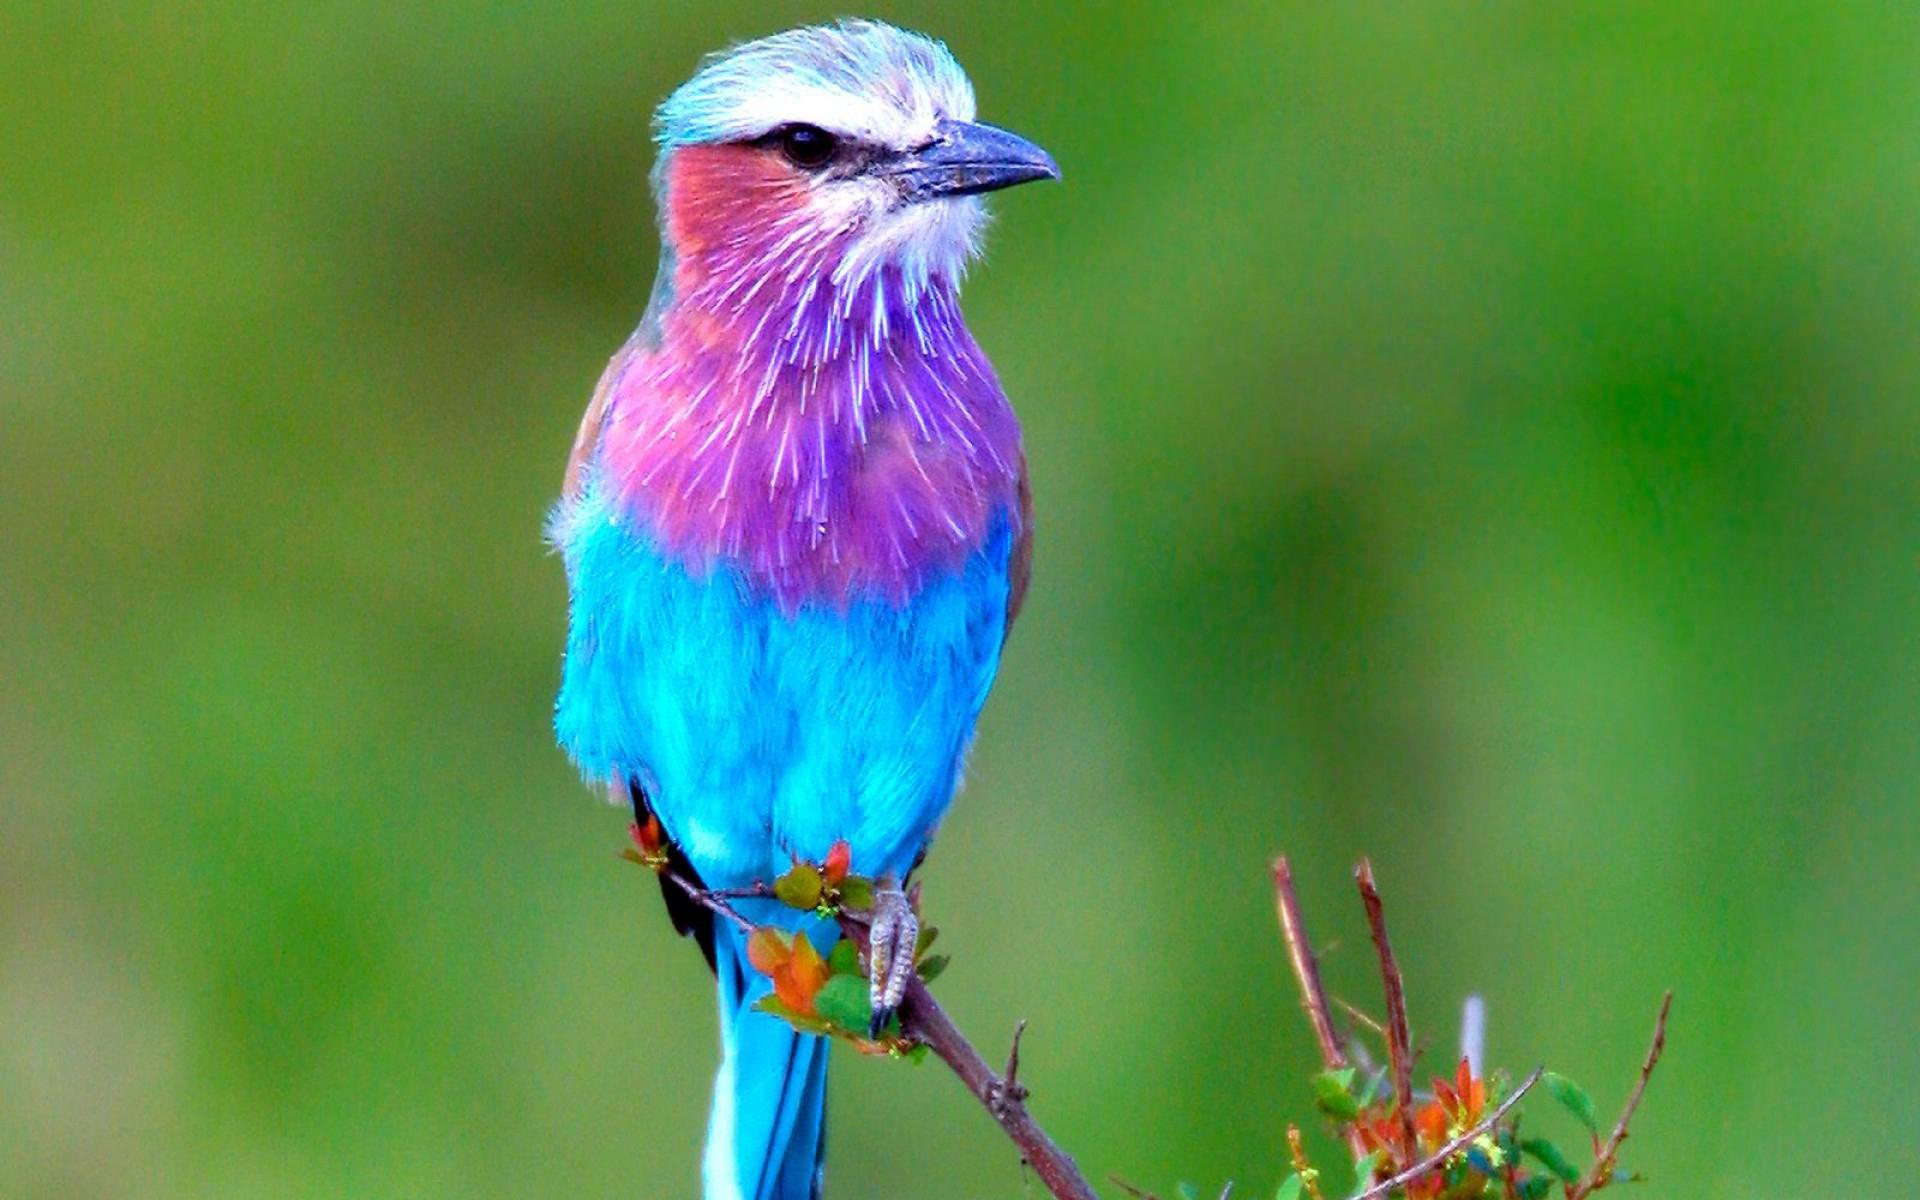 птица, цветная, клюв